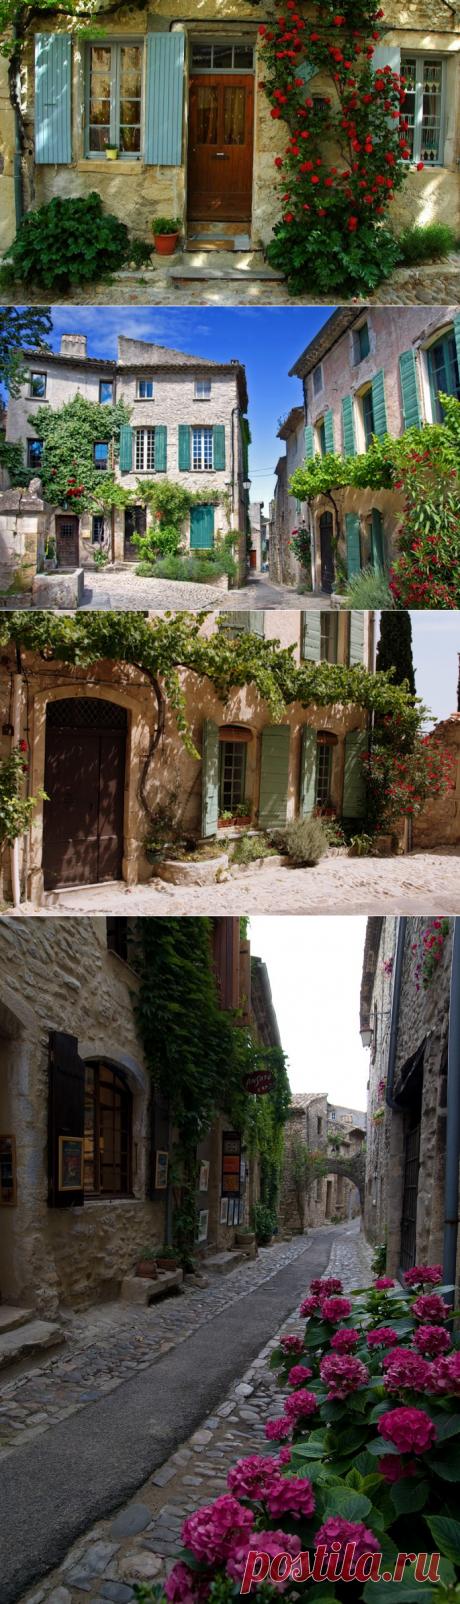 Везон-ла-Ромен (Vaison-la-Romaine). Прованс, Франция